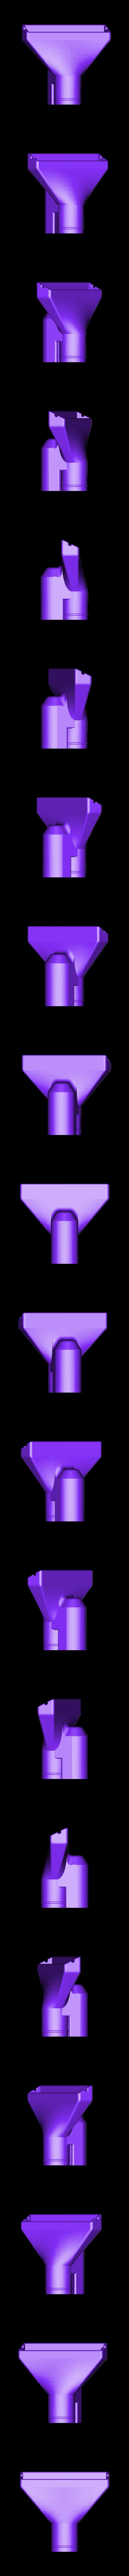 INTEX_Vacuum_nozzle.STL Download free STL file Pool vacuum cleaner nozzle for INTEX filter hose • 3D printer template, Cerragh